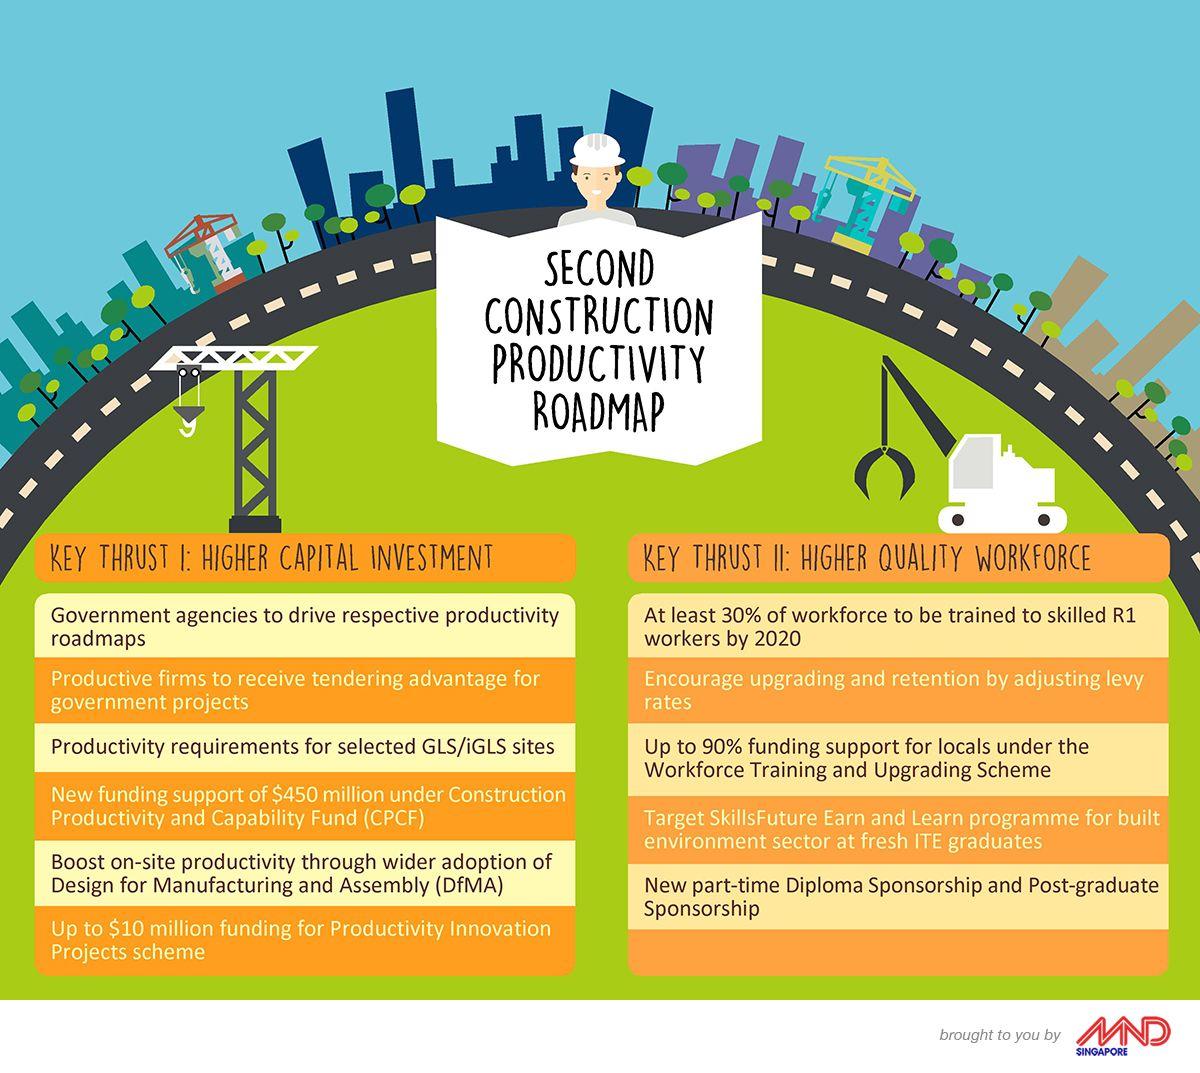 Raising Construction Productivity through a 2nd